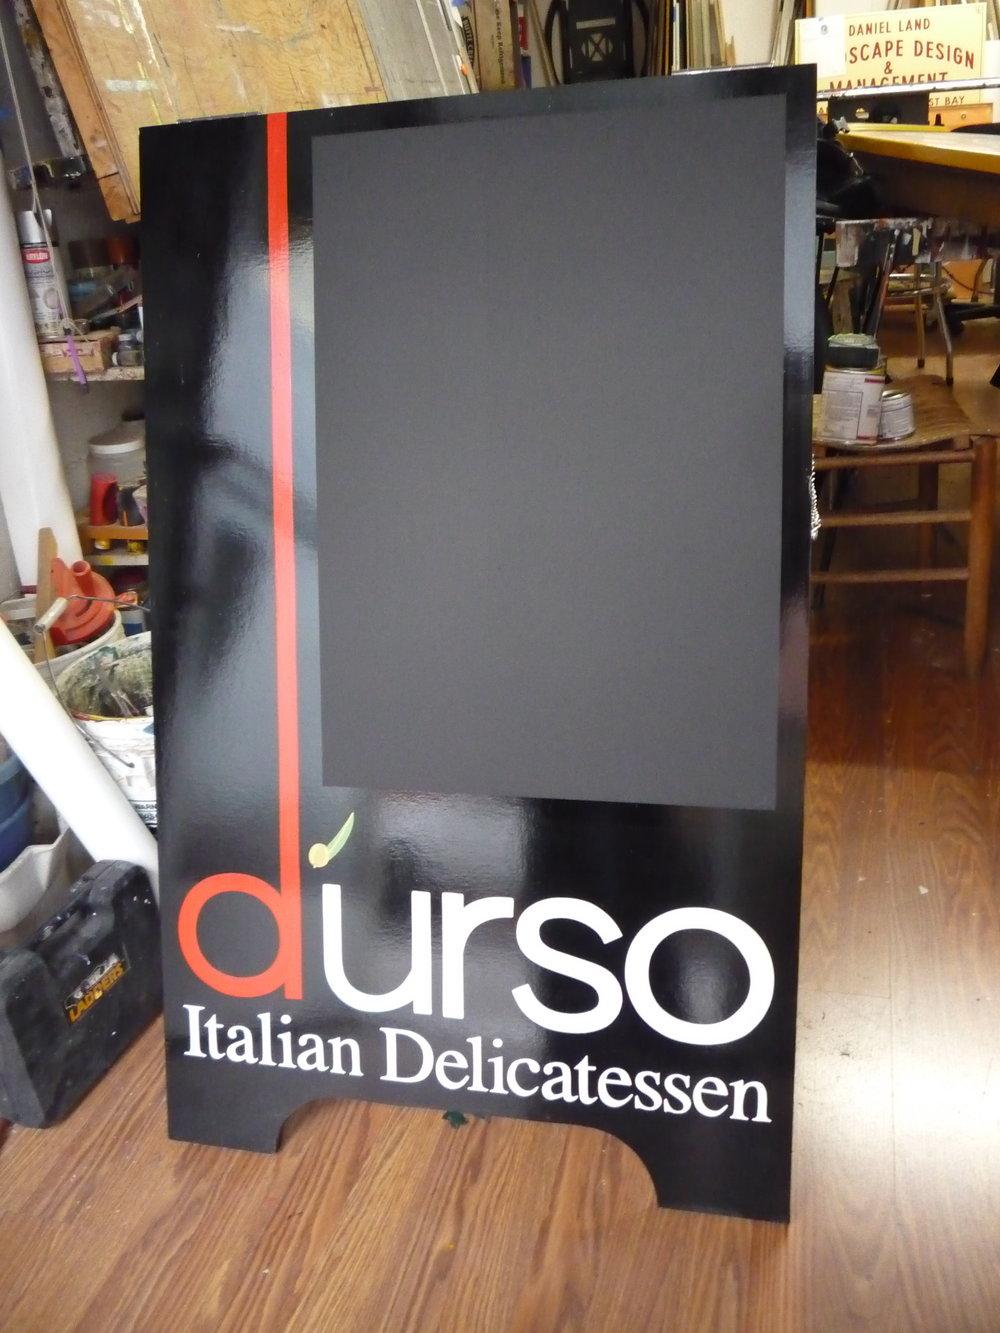 A-FRAME-durso-sandwich-board_4306550883_o.jpg